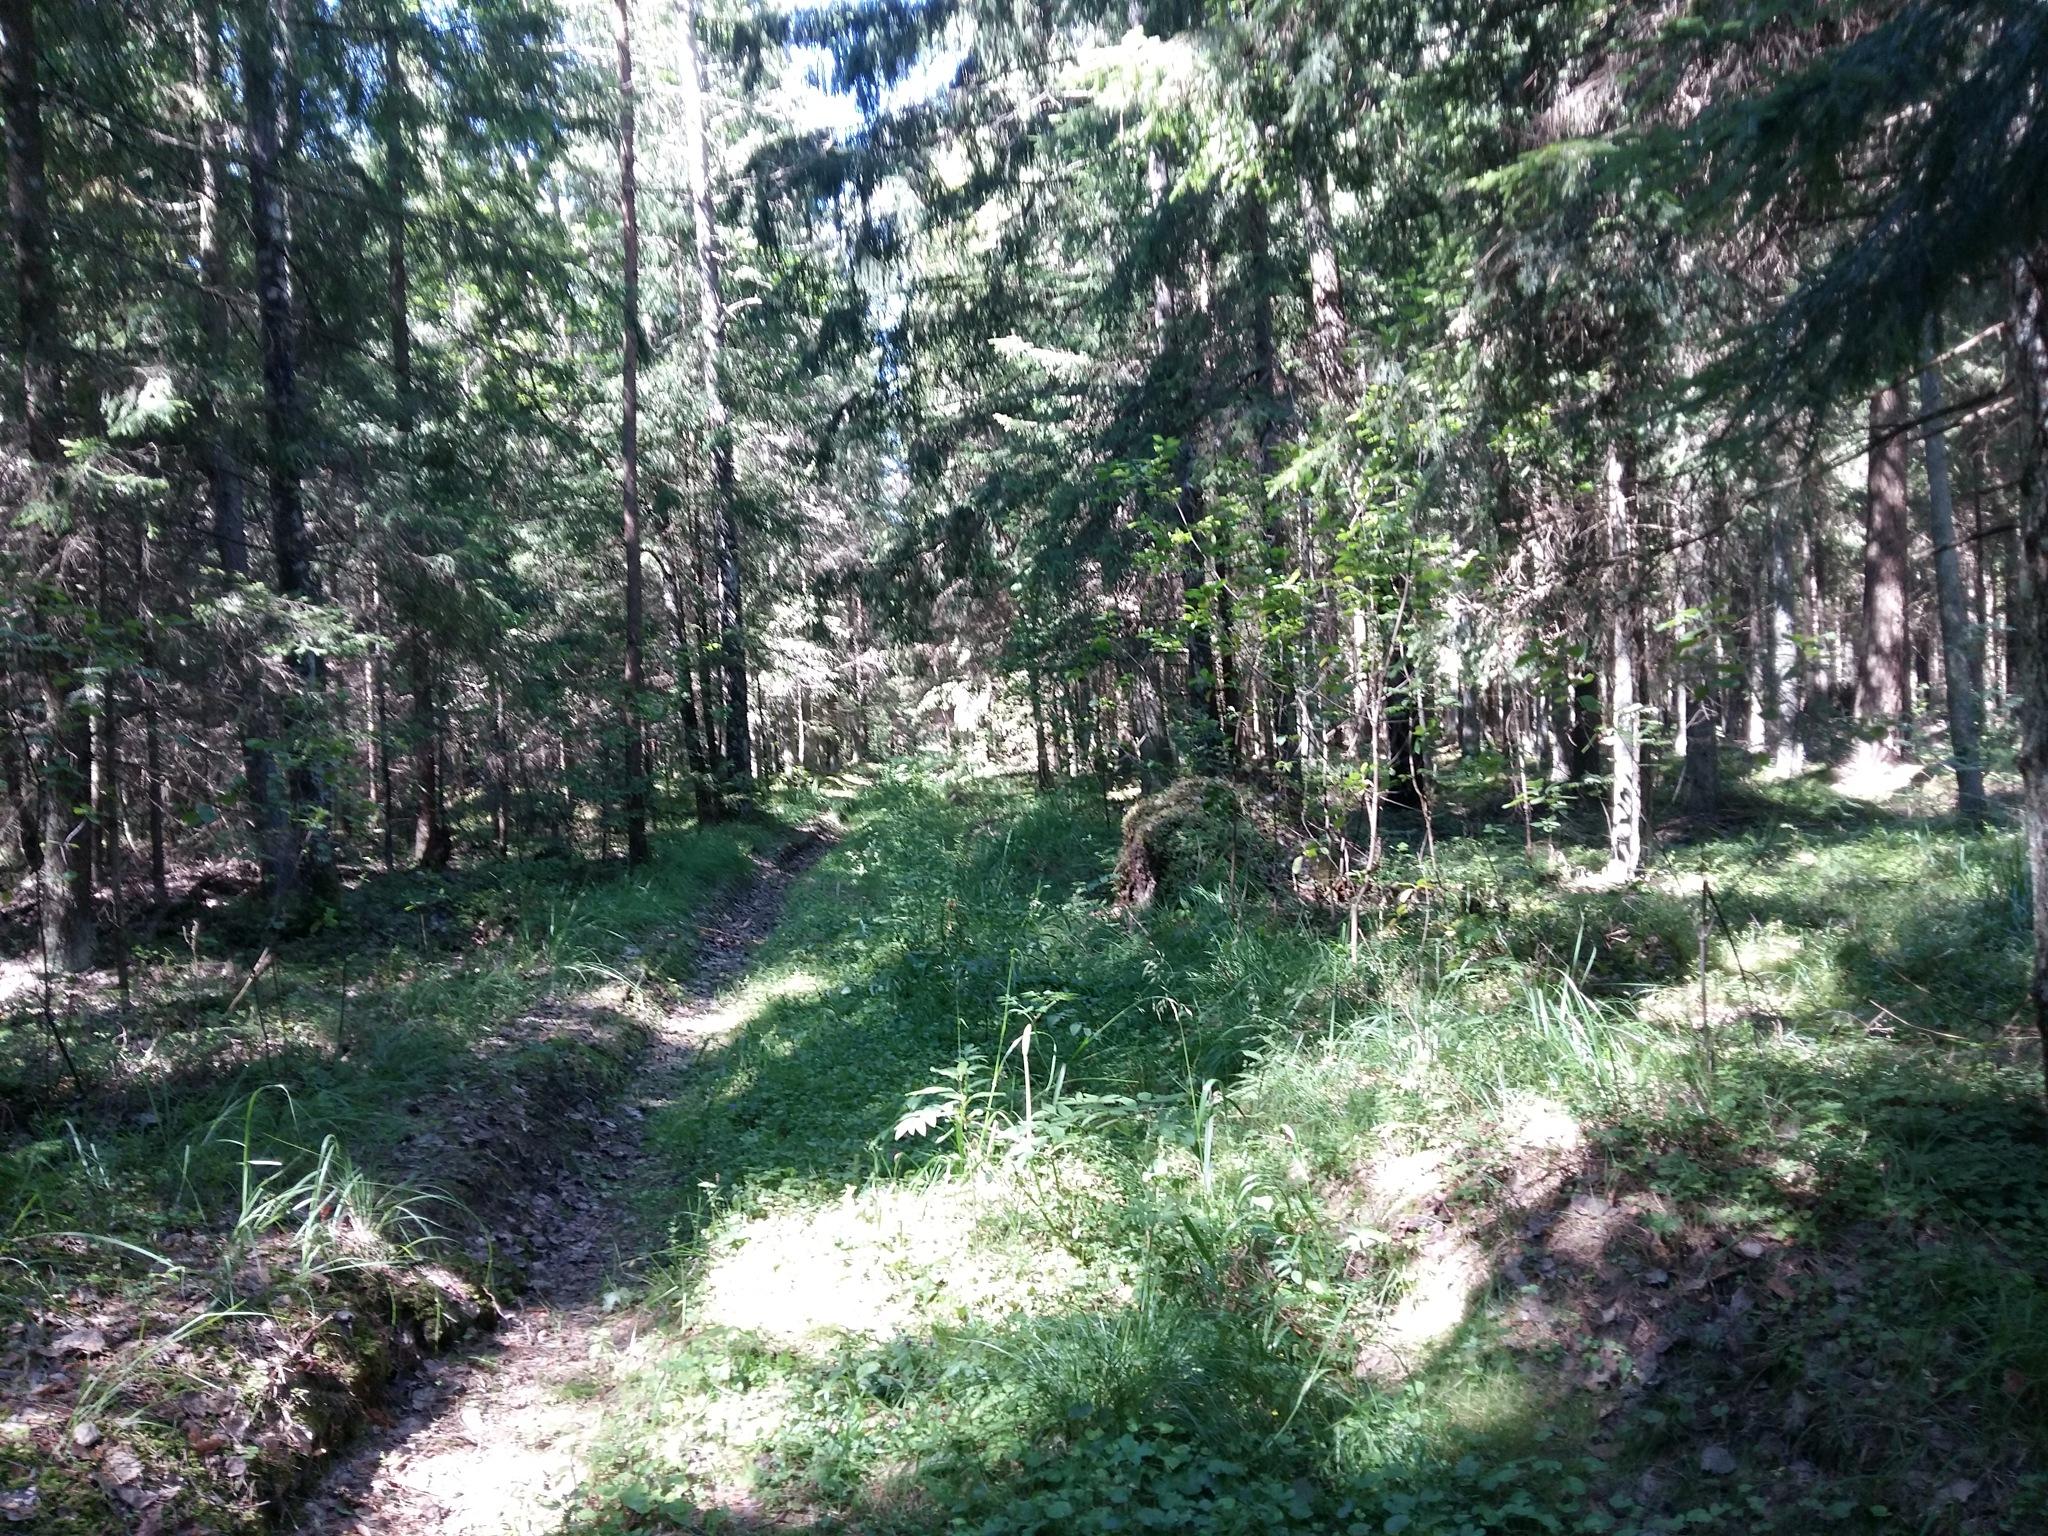 The trail im the forest by uzkuraitiene62